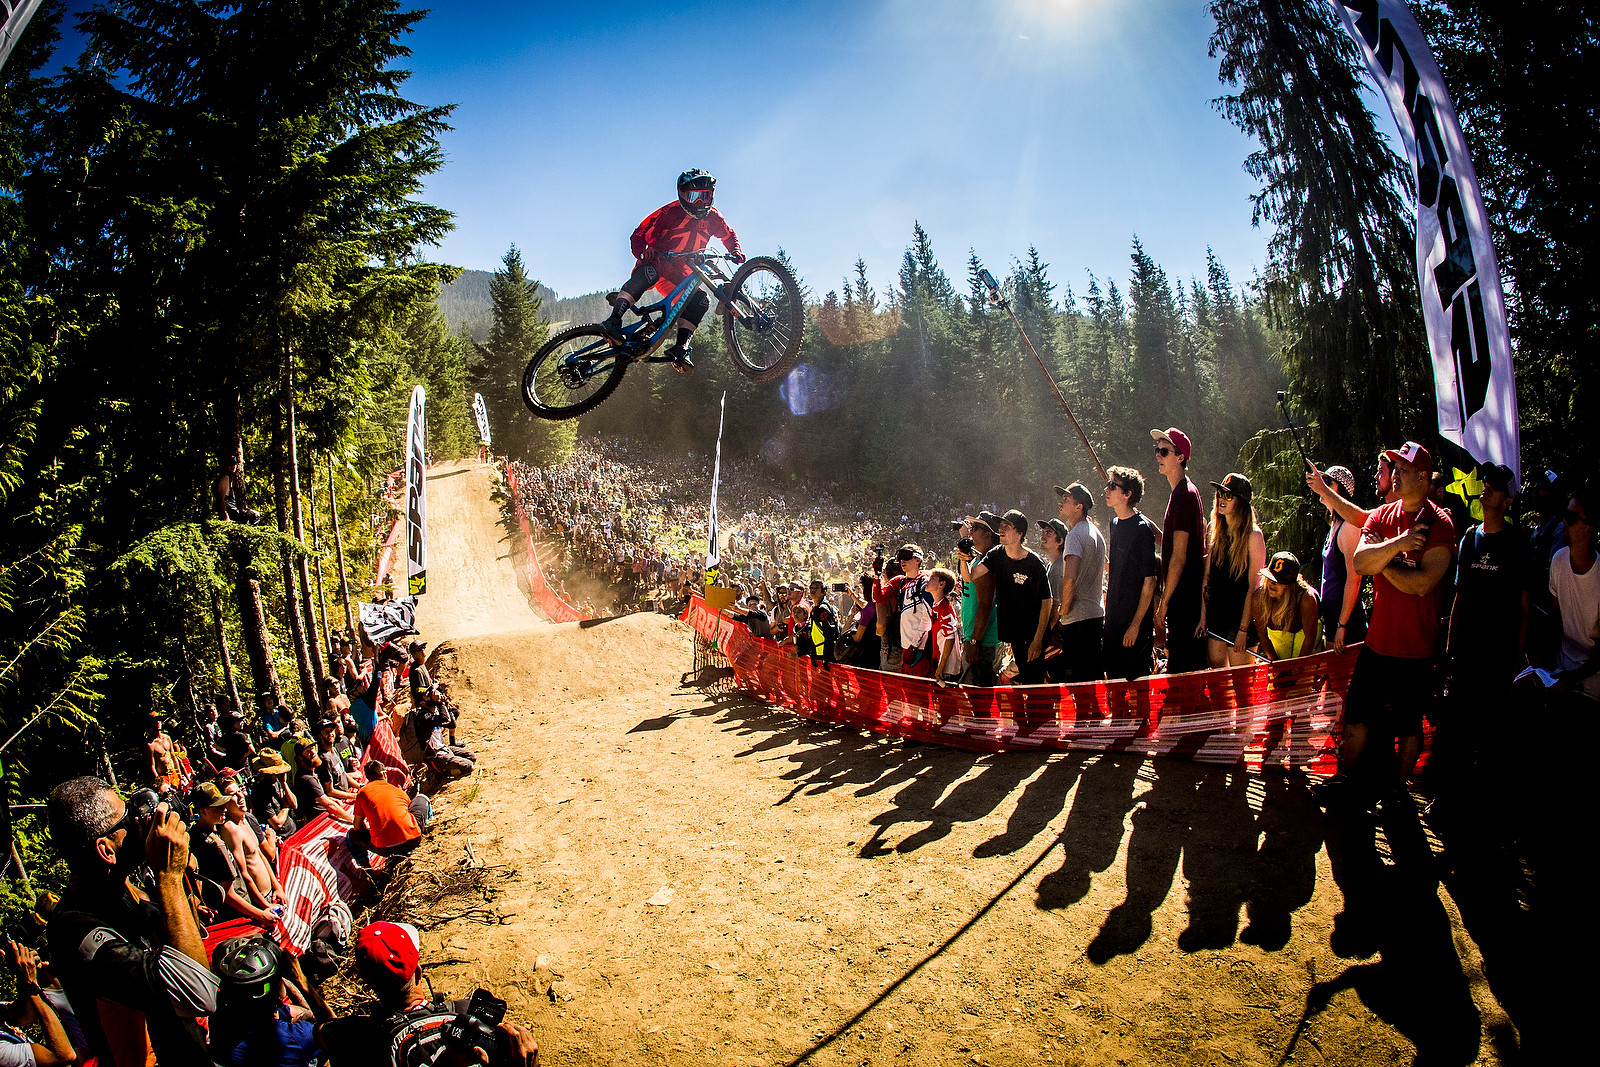 Jamie Hill - Whip Off World Champs Photo Blast - Mountain Biking Pictures - Vital MTB